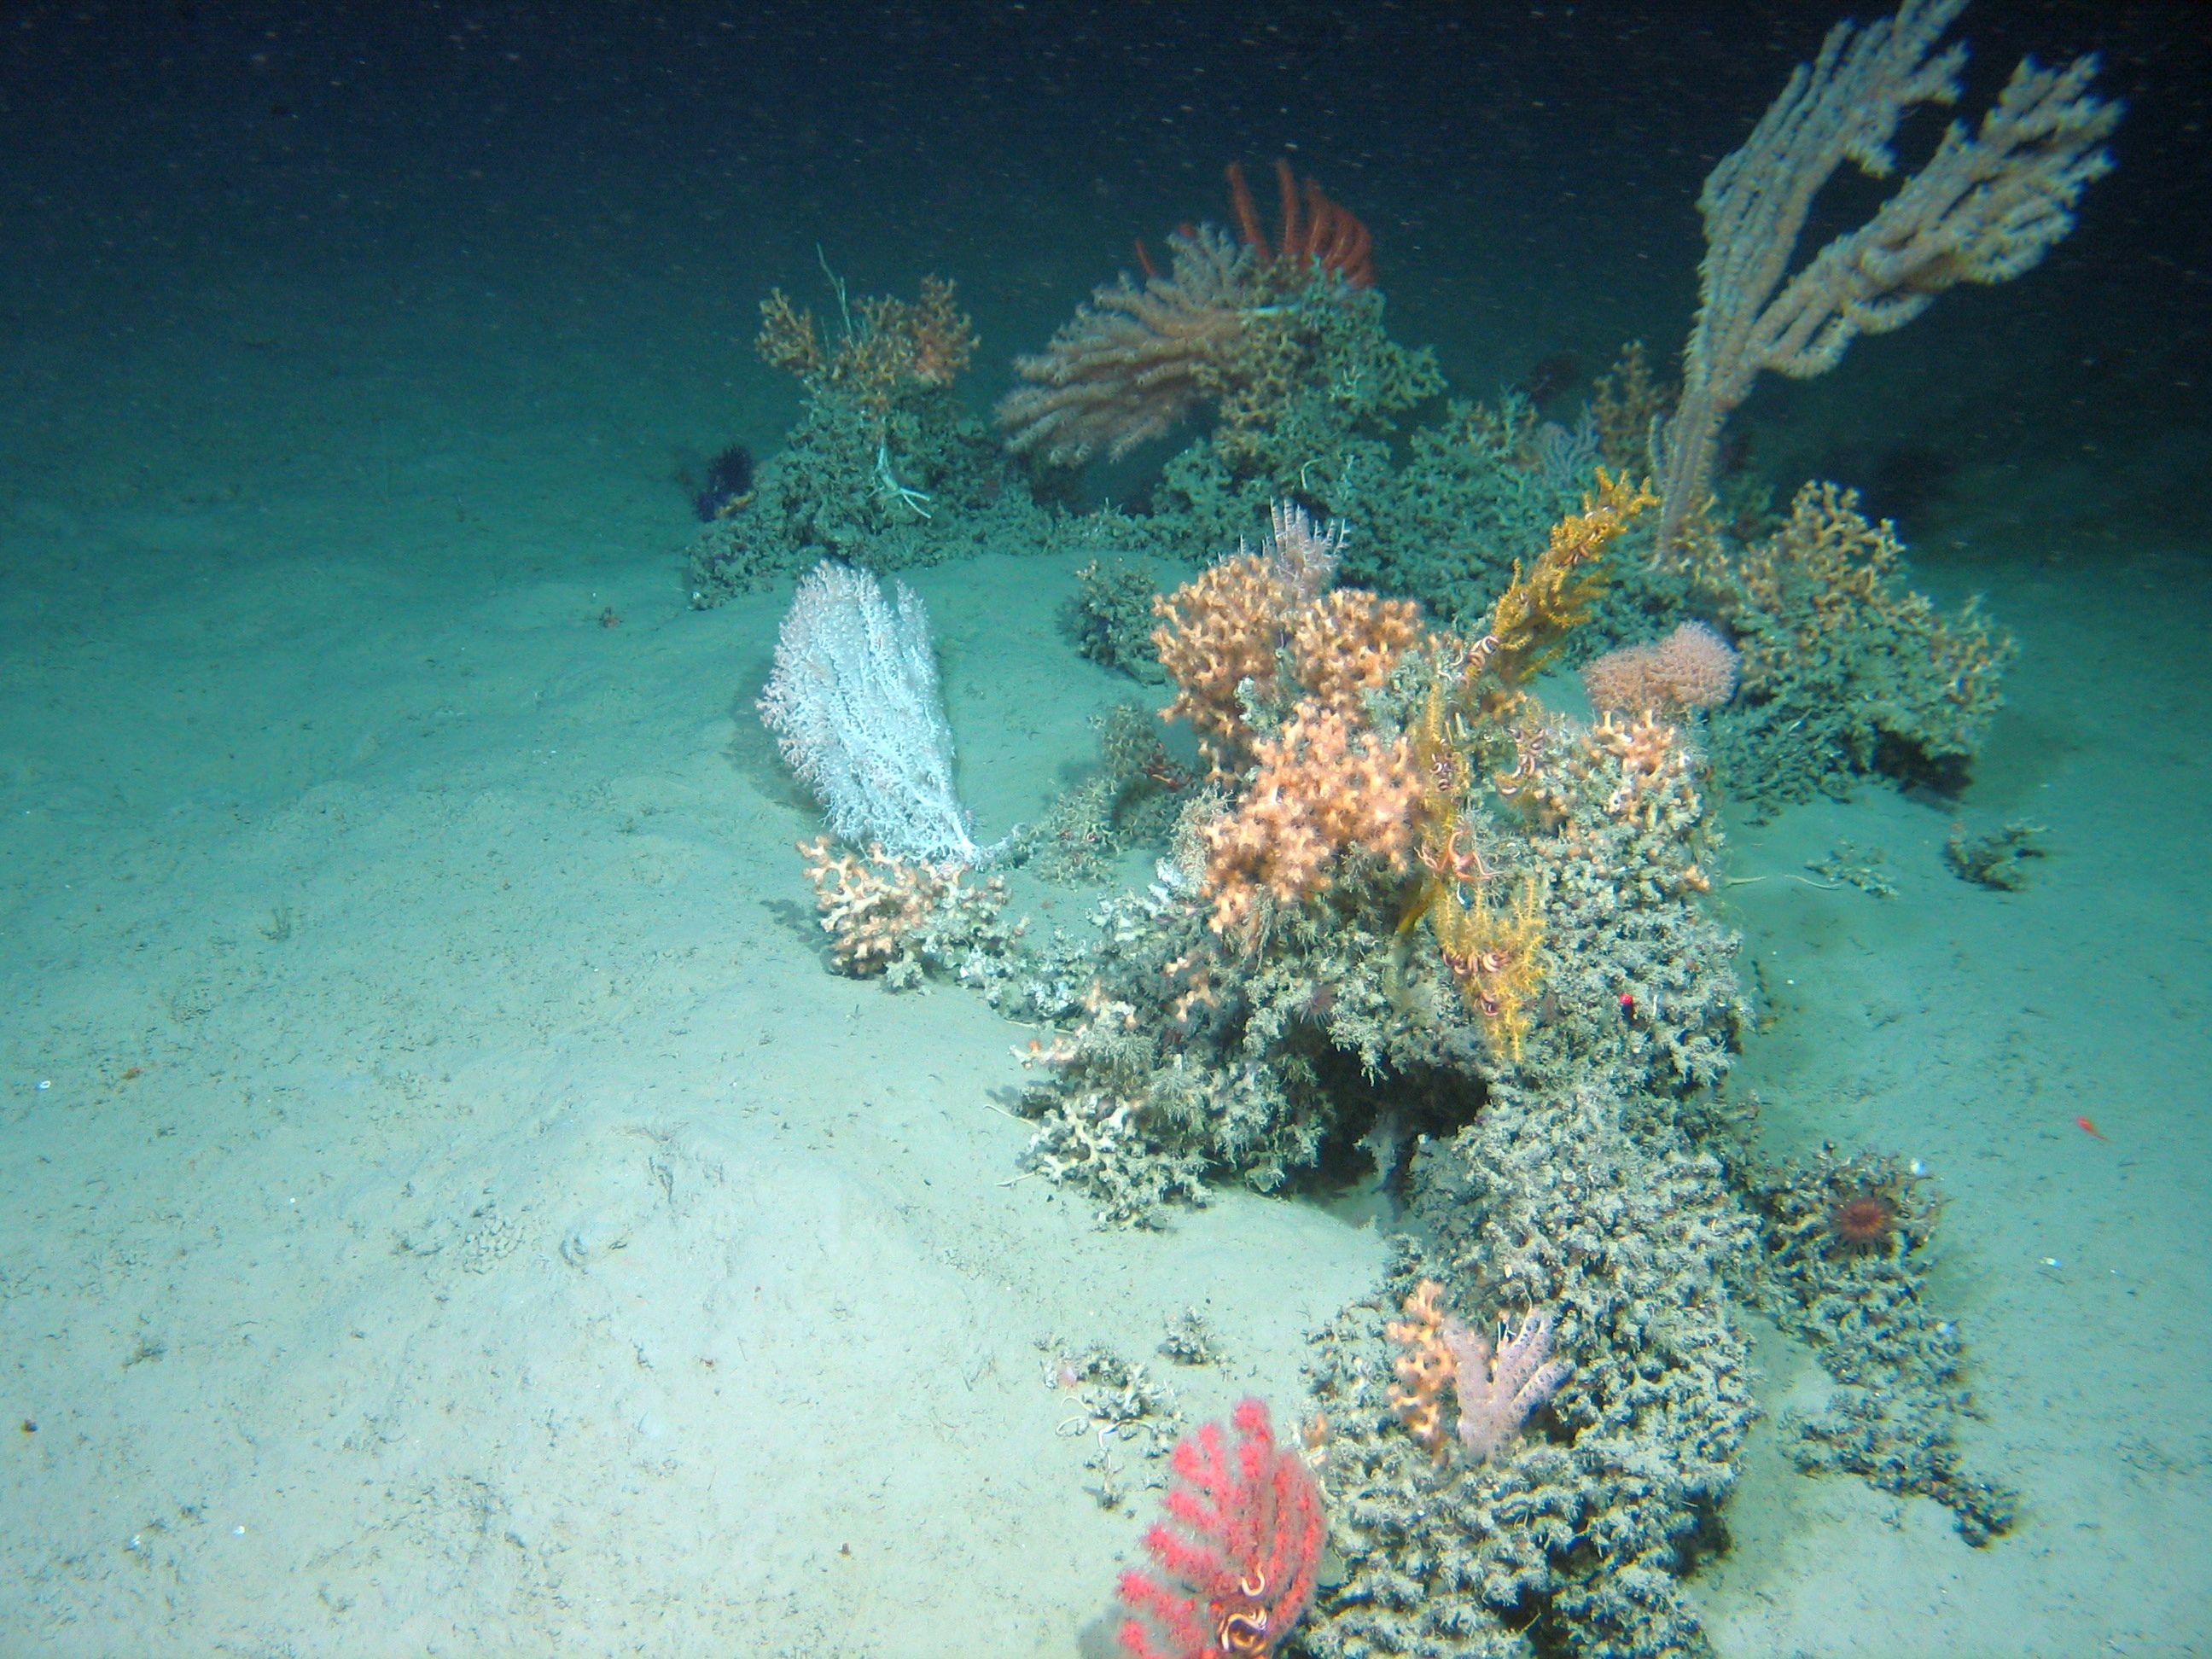 Irish deep-sea cold water corals